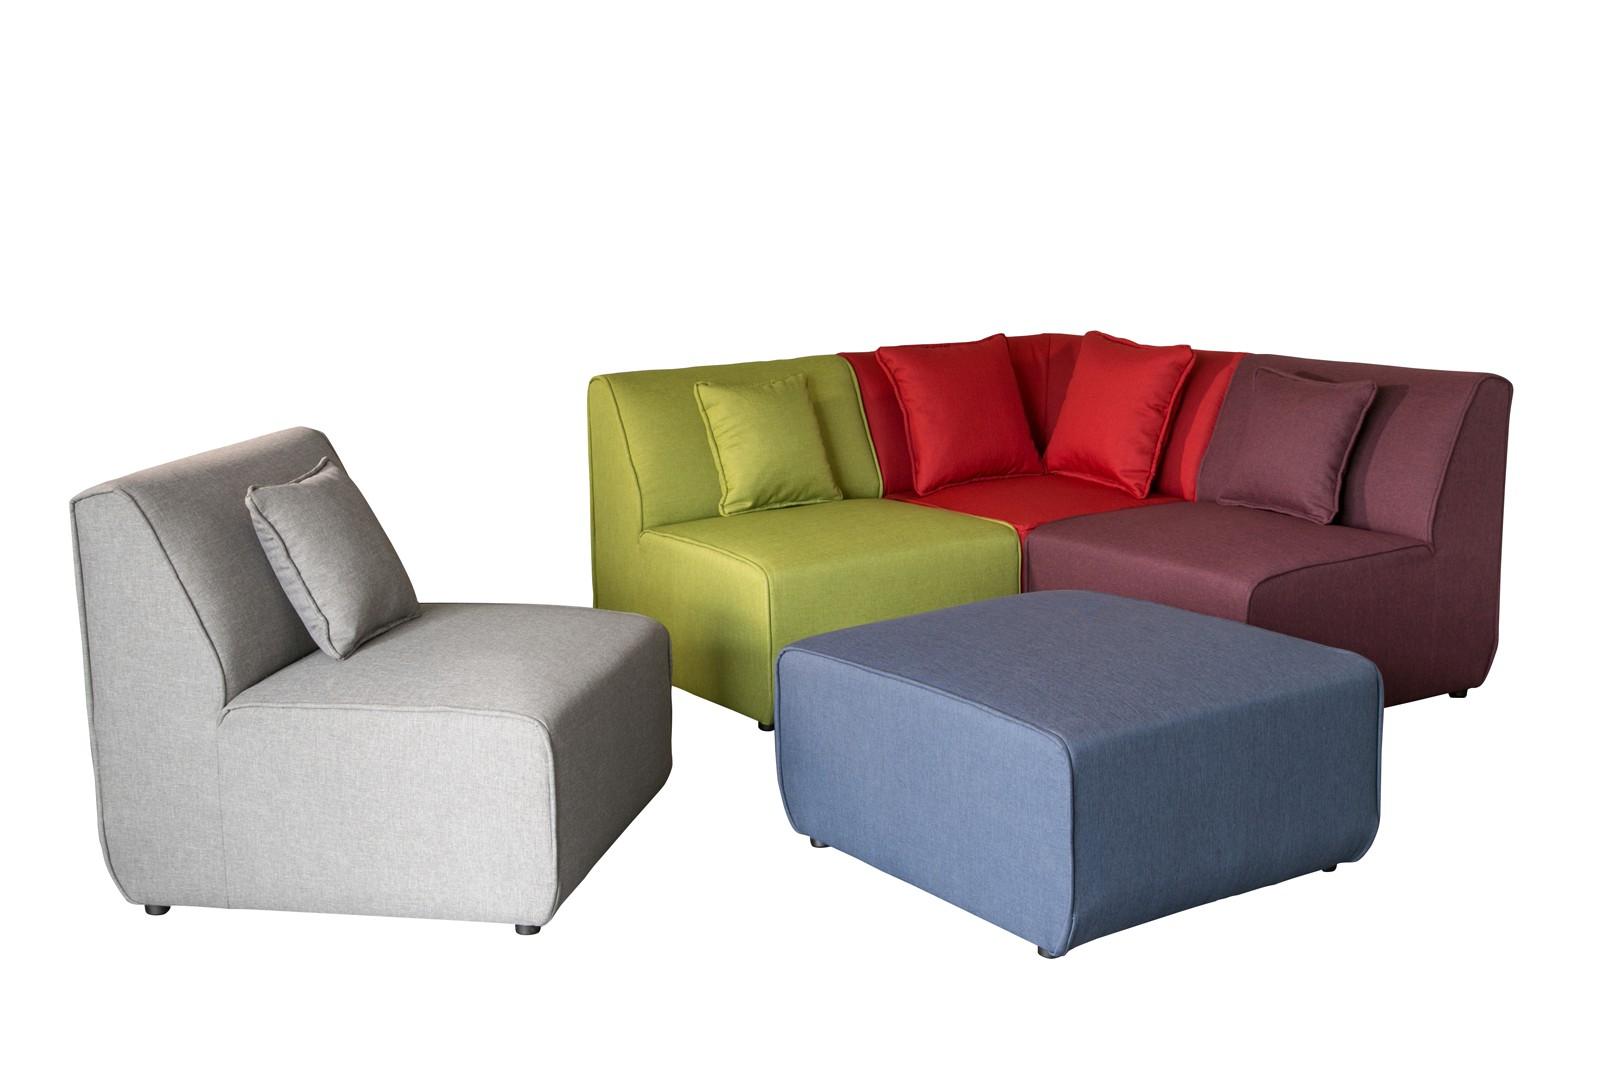 canapé bois tissu